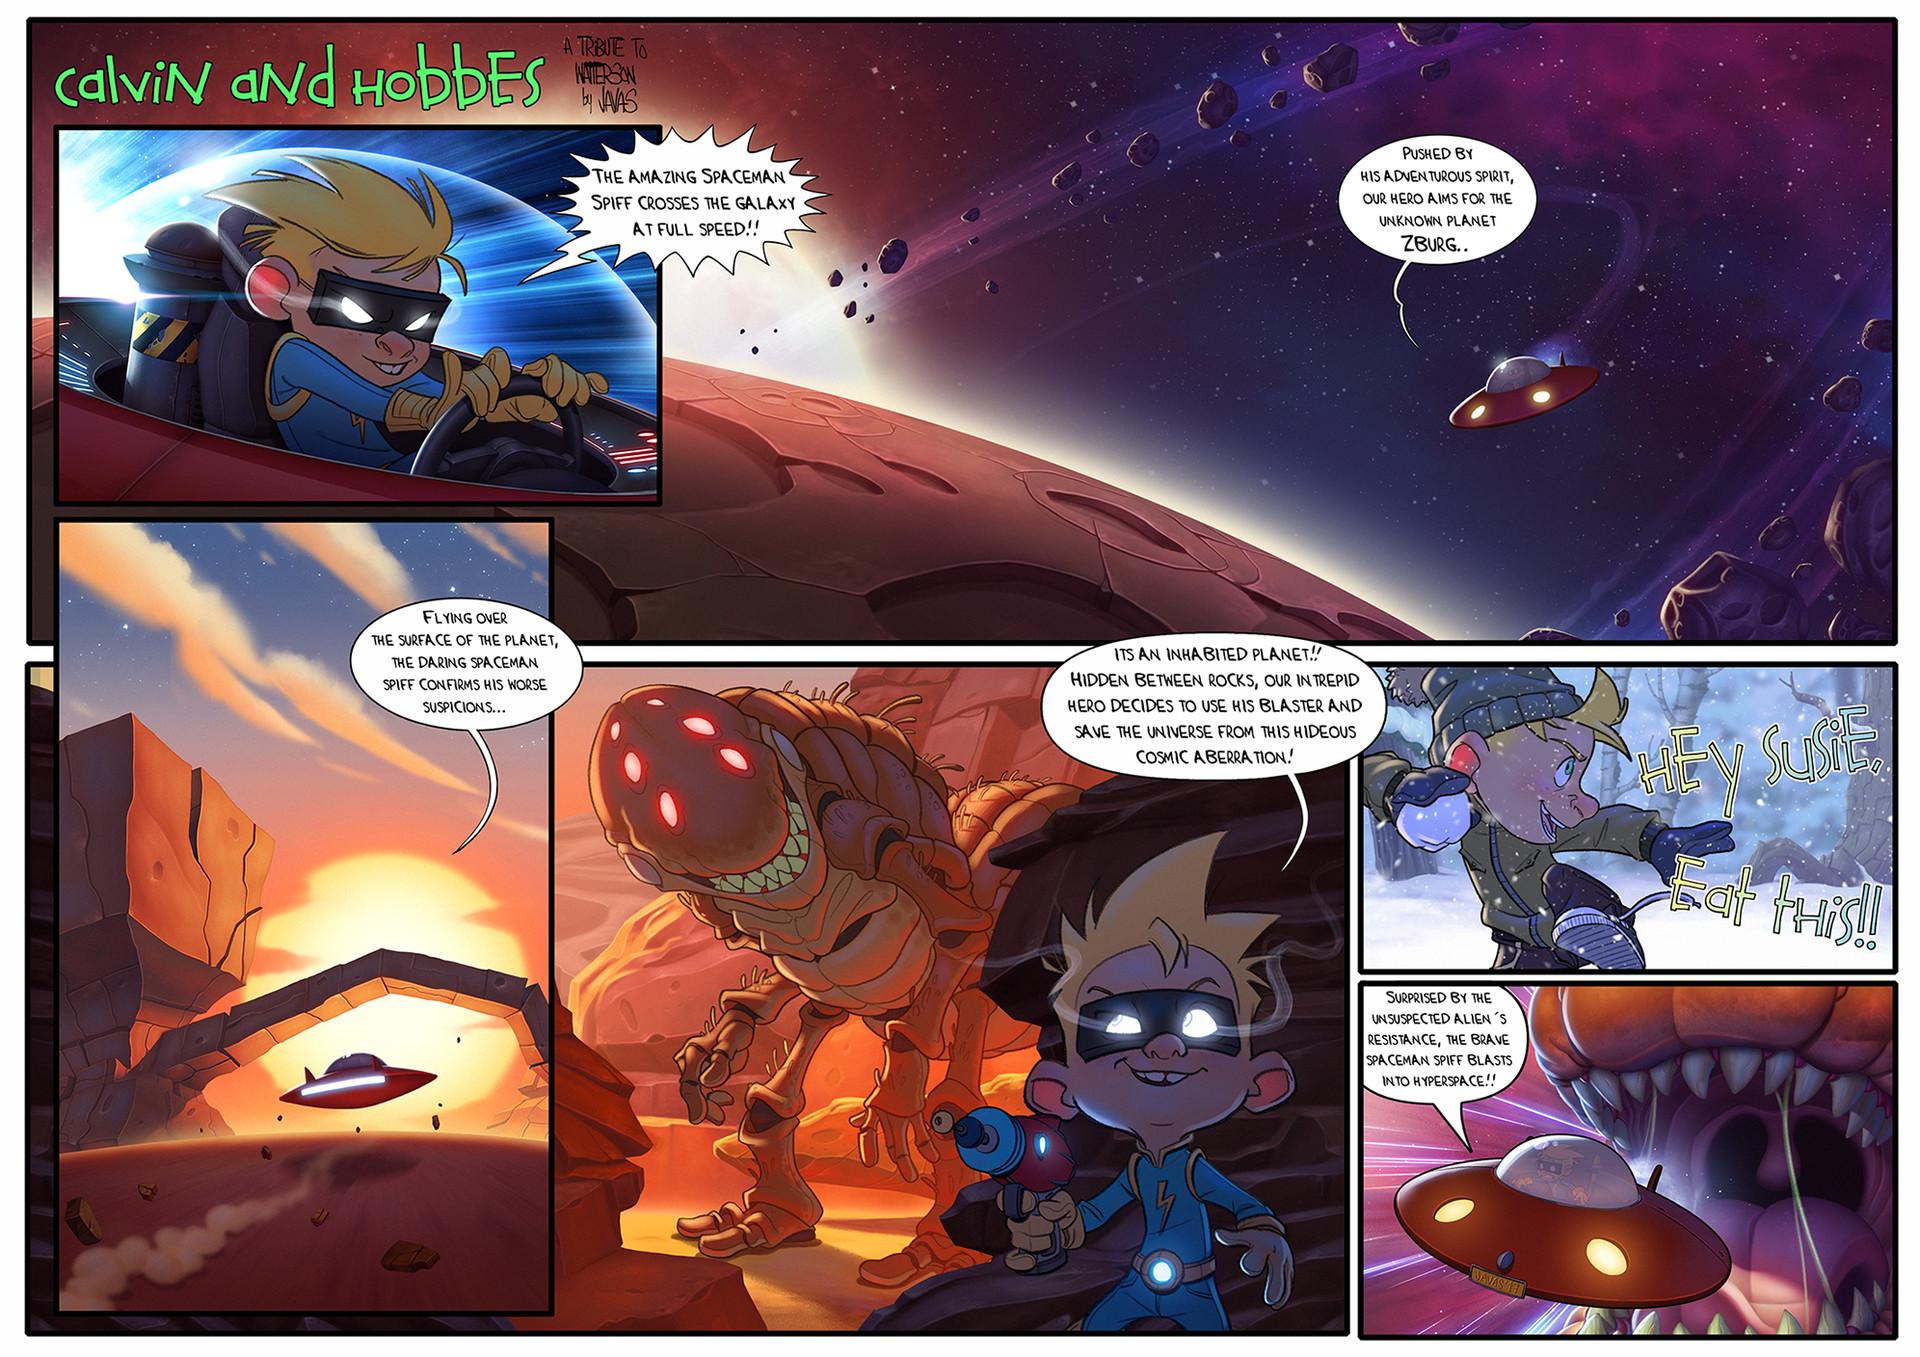 this-calvin-hobbes-spaceman-spiff-tribute-art-is-absolutley-supurb1